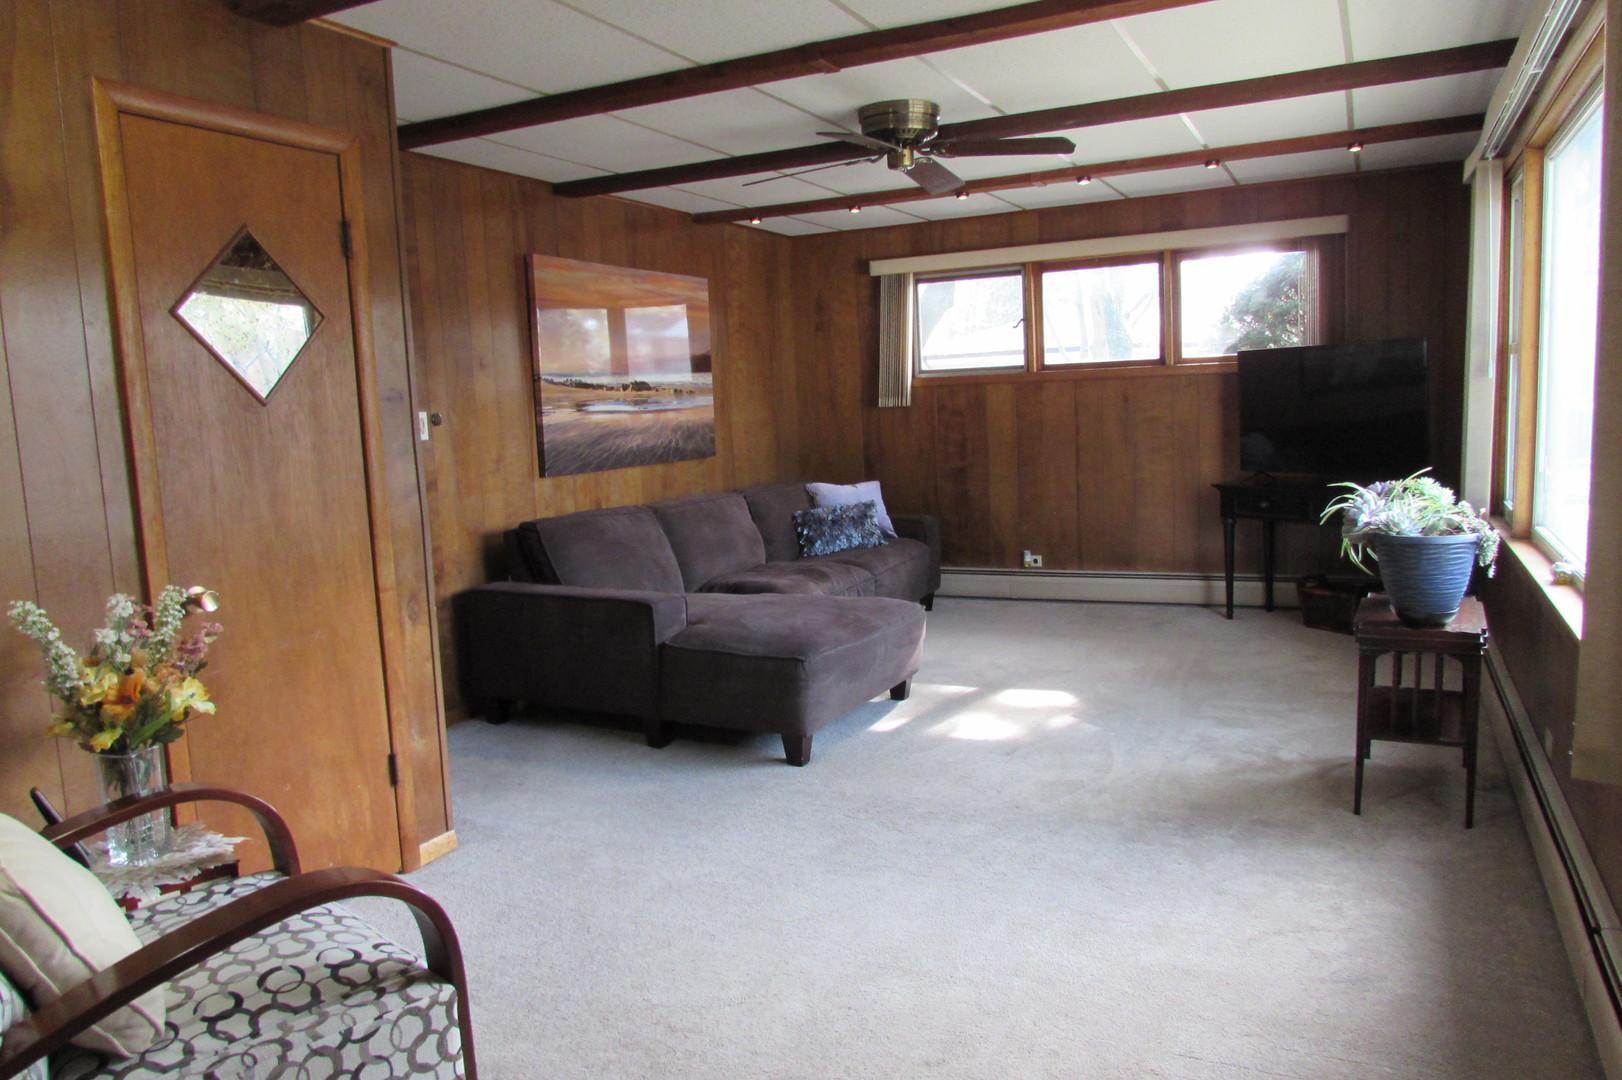 824 Hull, Westchester, Illinois, 60154